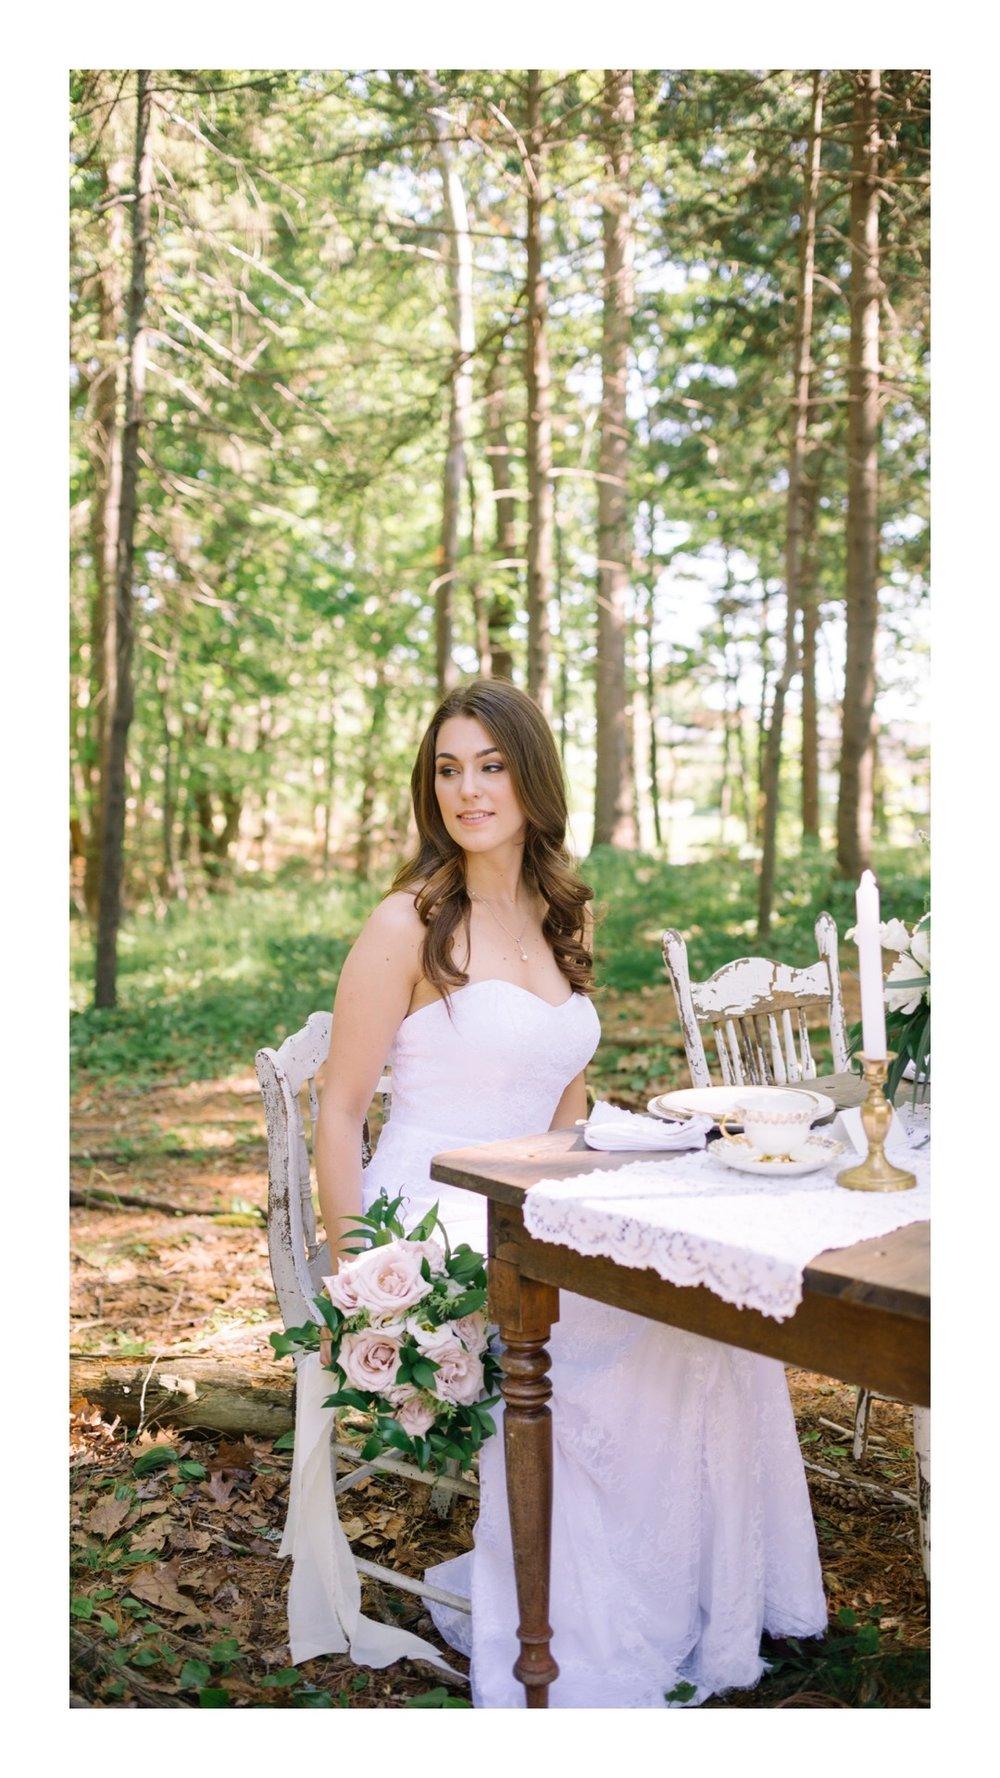 Halifax Wedding Photographer Styled Shoot - Gray Weddings & Events - Sinead Dubeau Photography 05